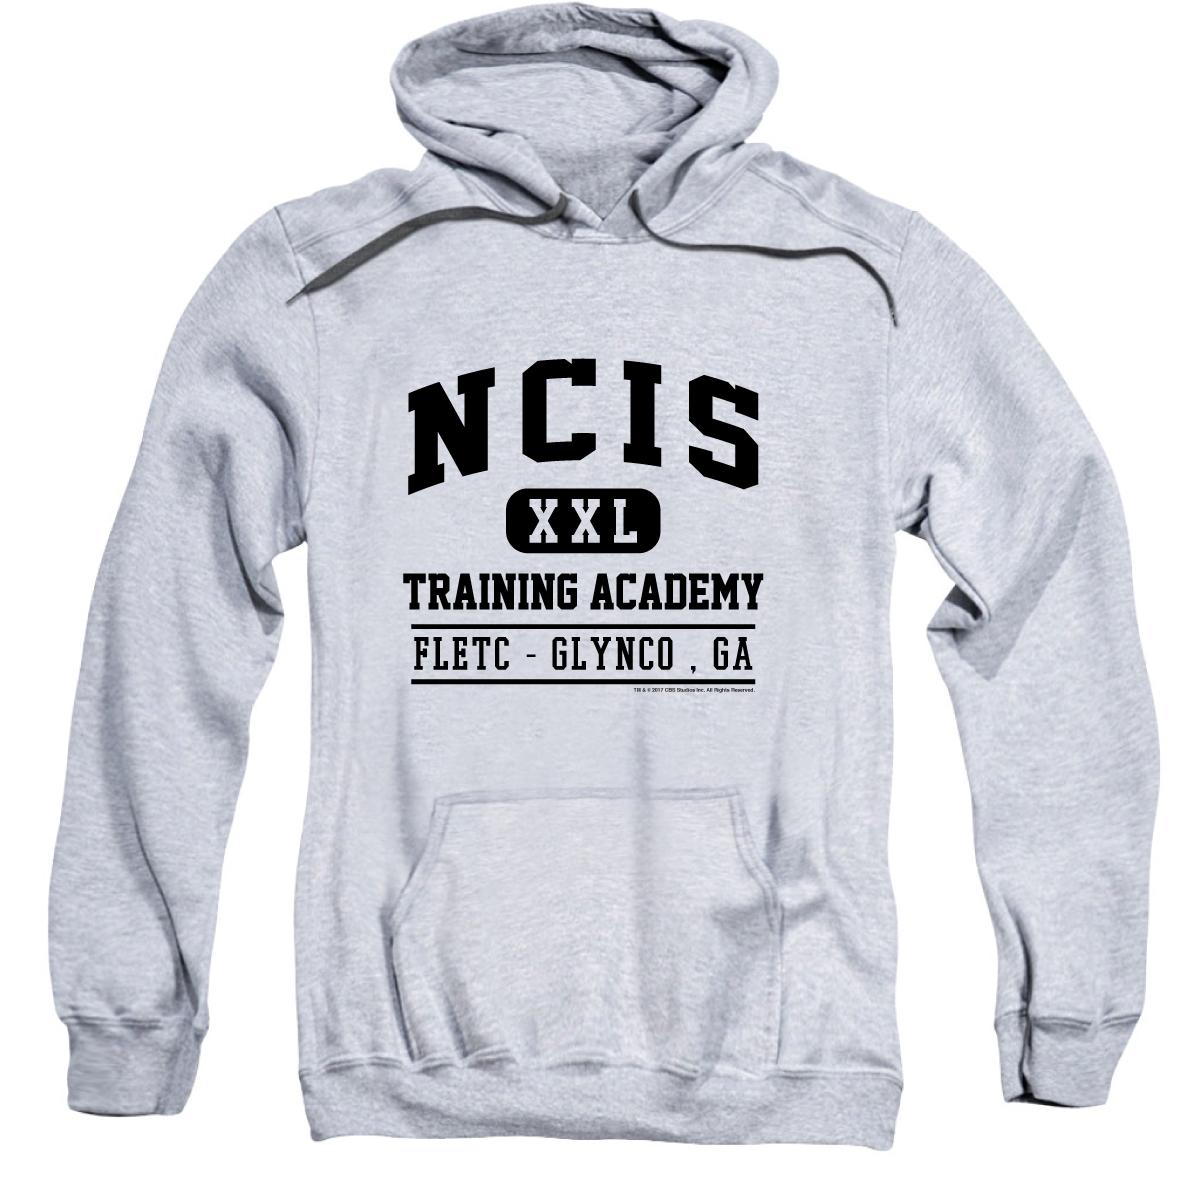 NCIS Training Academy Hoodie [Heather Grey]